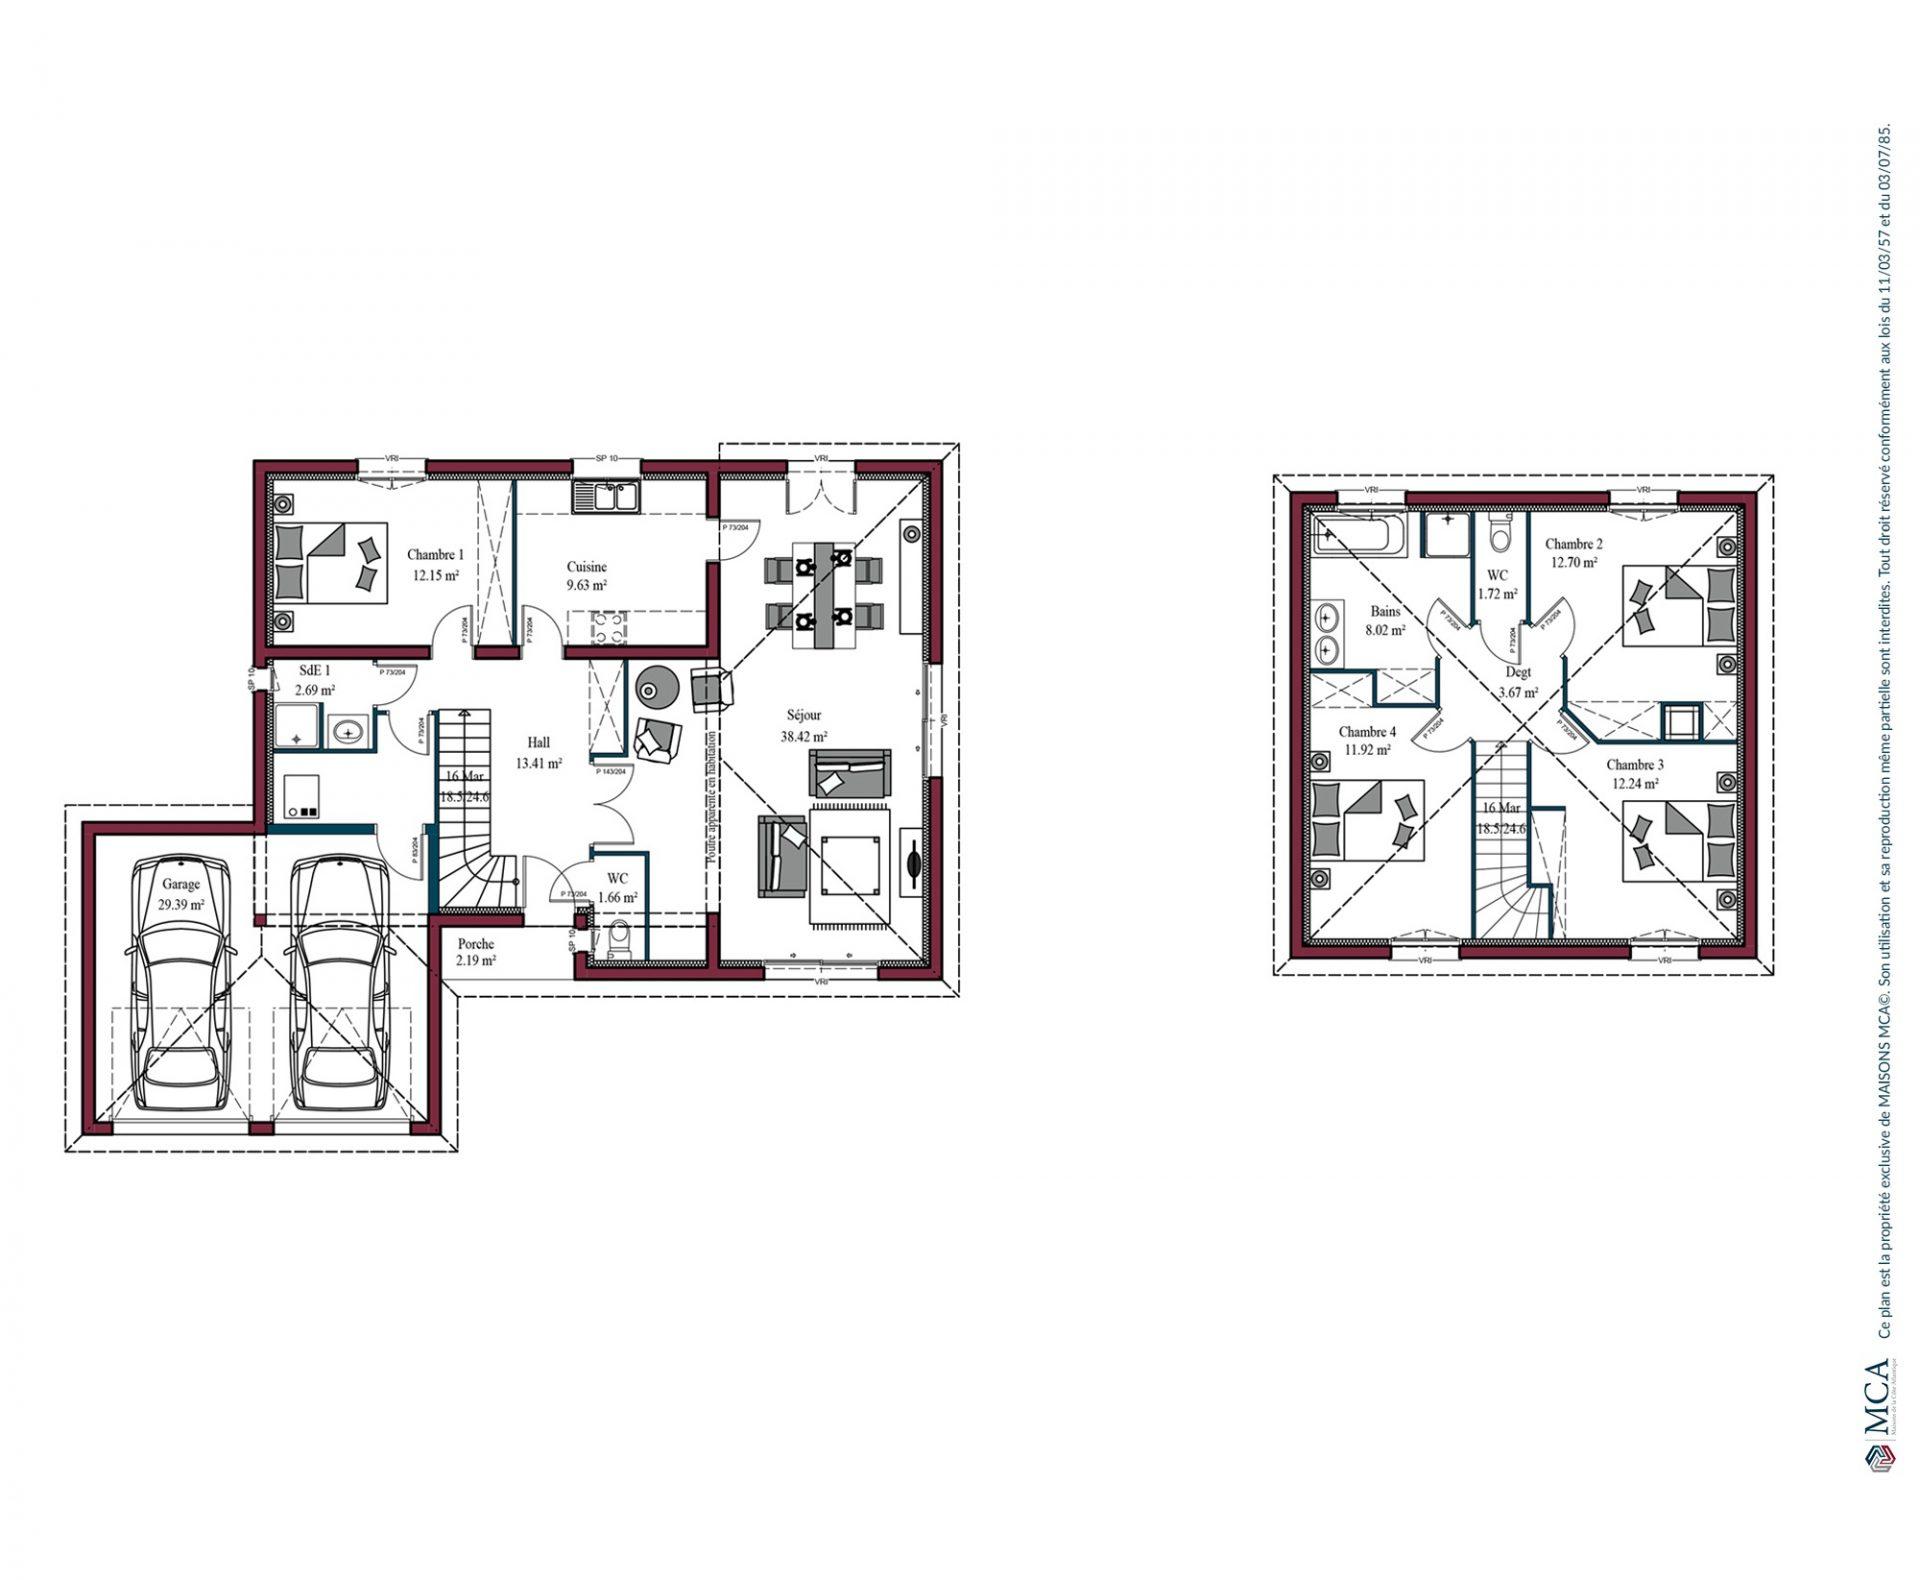 Plan Birdie | 132 m²